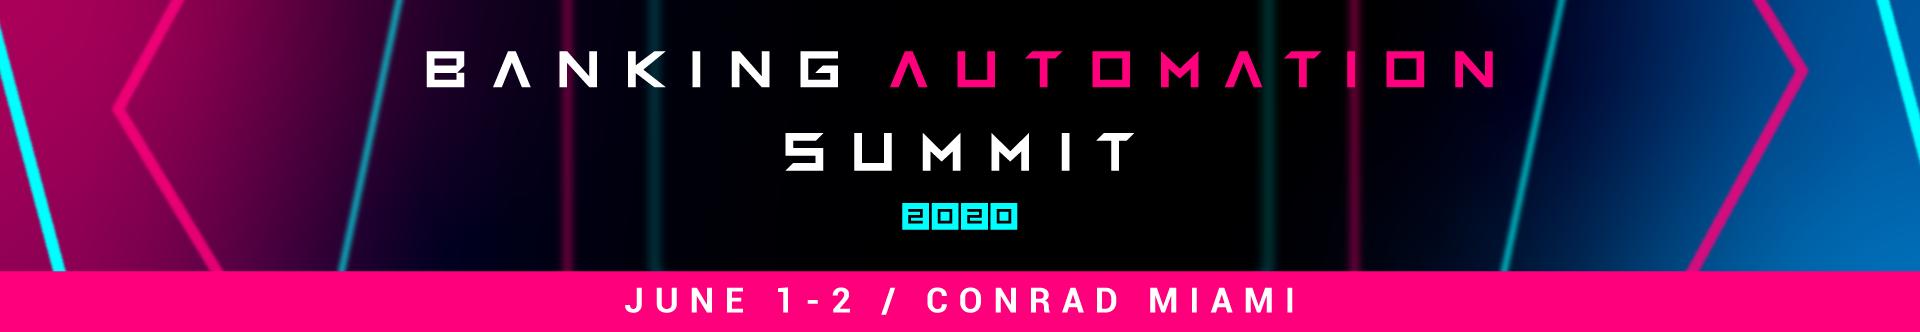 Banking Automation Summit